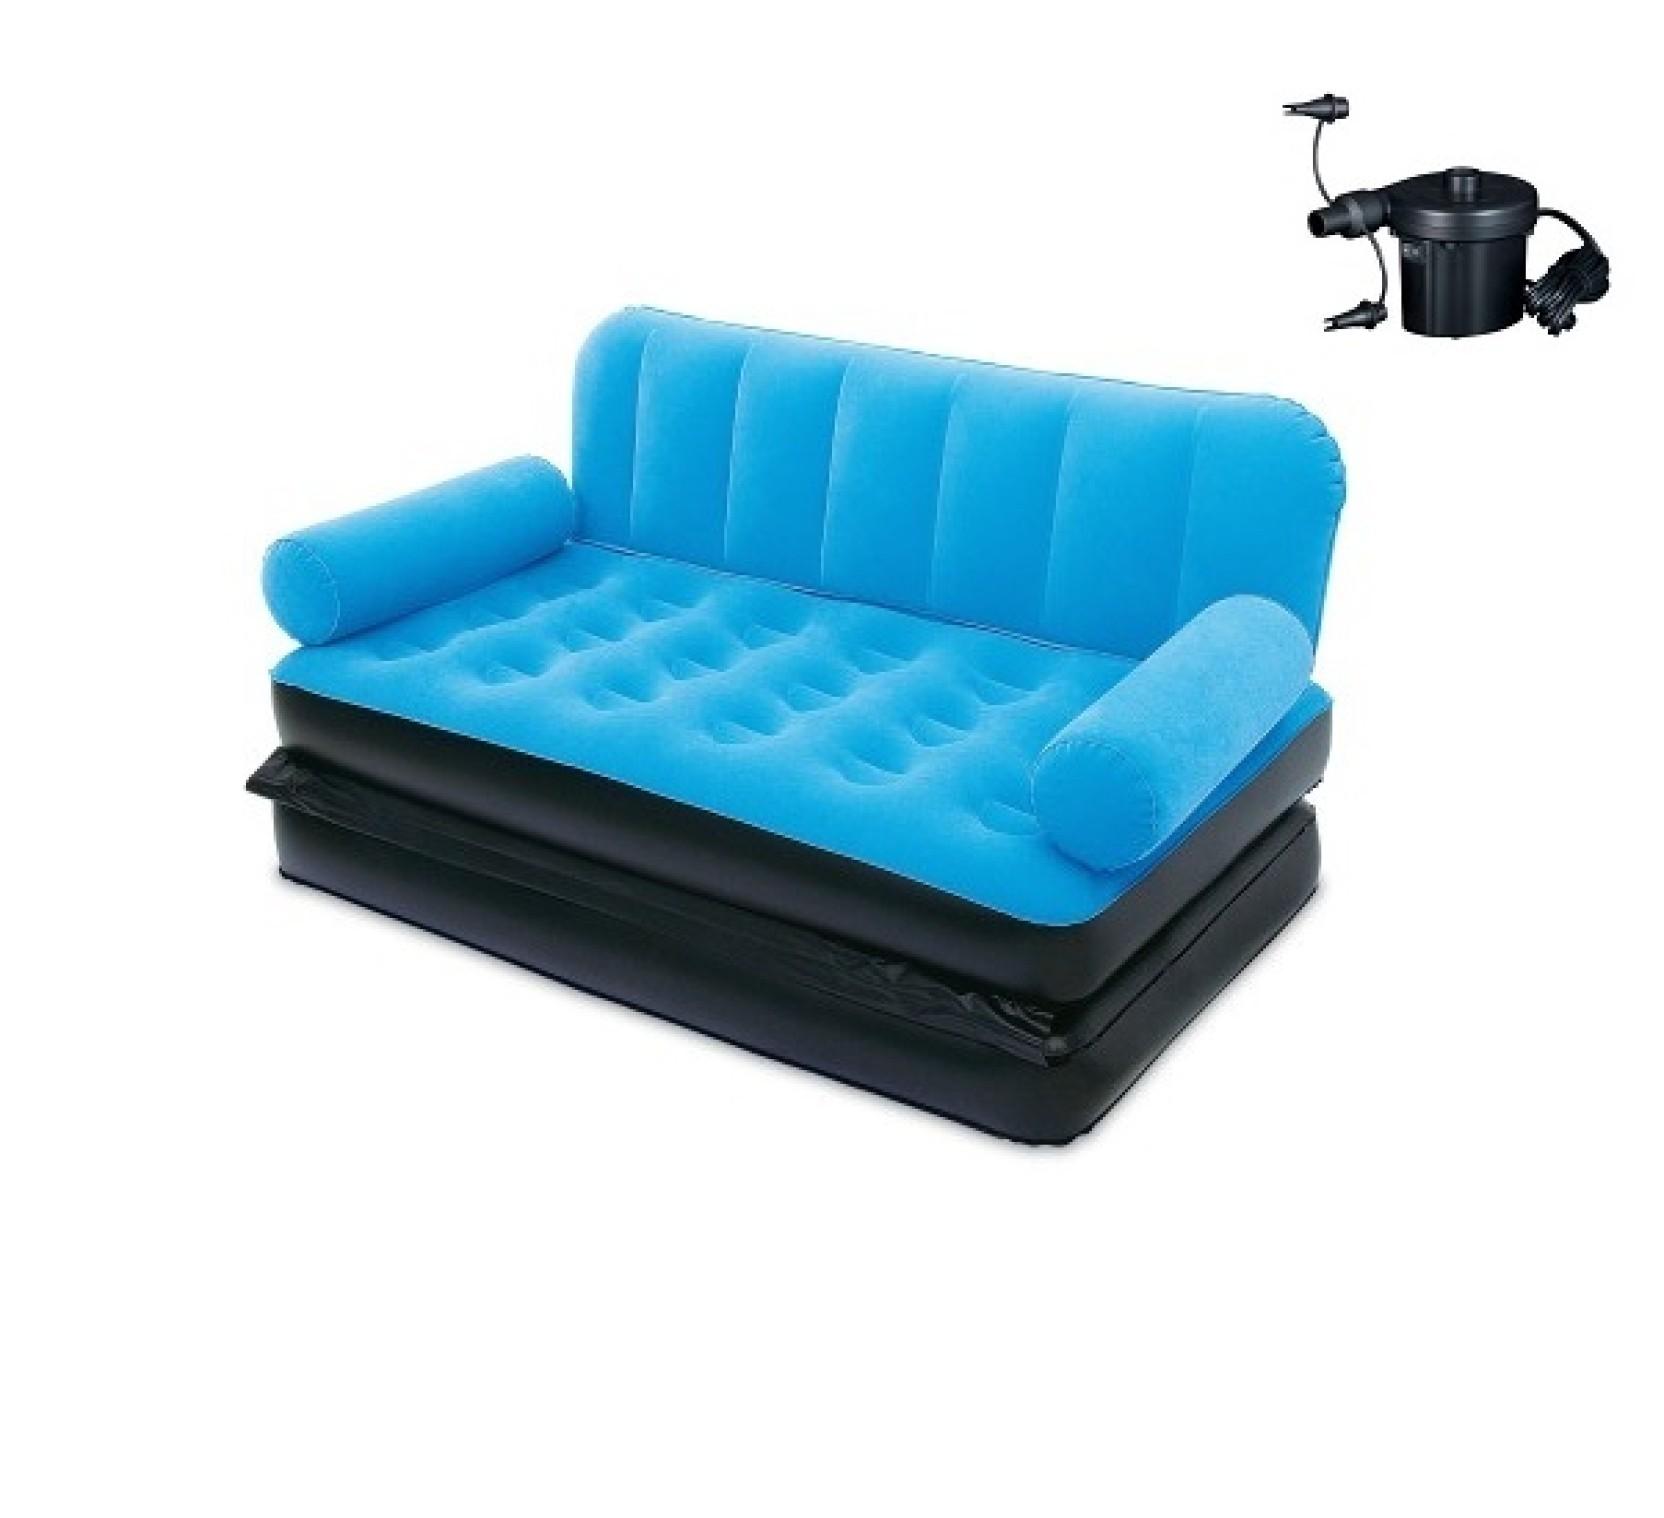 Air Sofa Rate: MSE Airsofa Cum Indoor Outdoor Bed 033 PVC 2 Seater